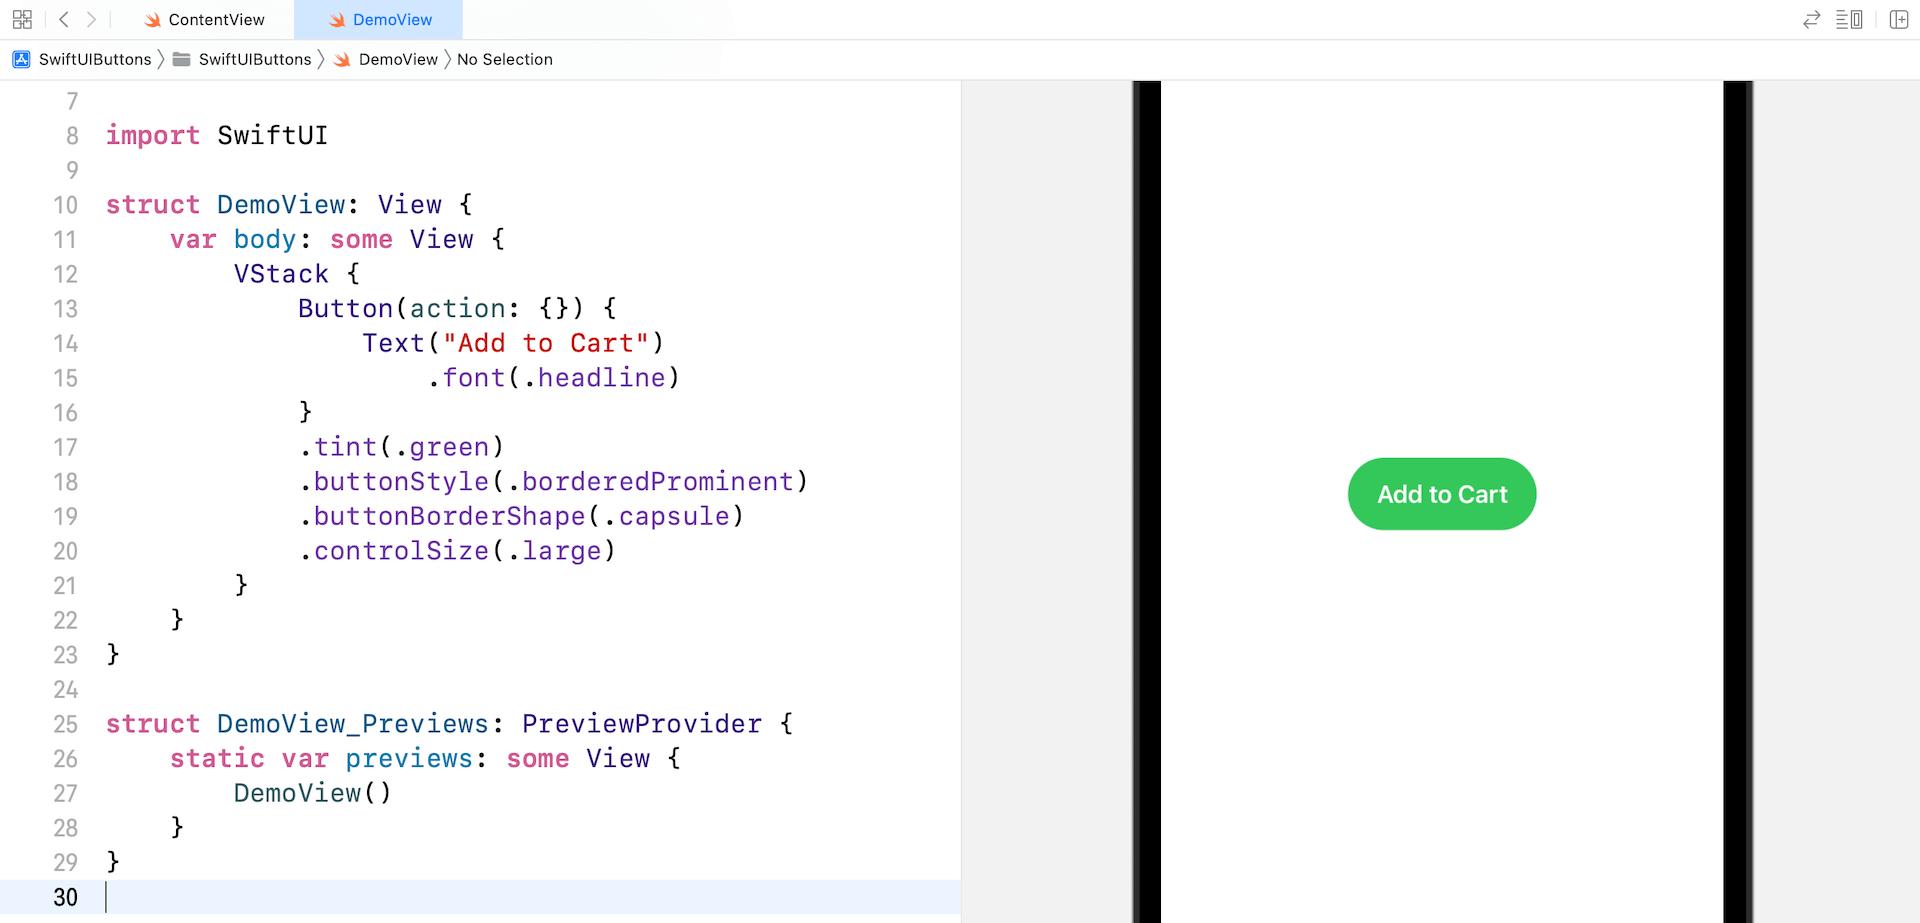 swiftui-button-border-shape